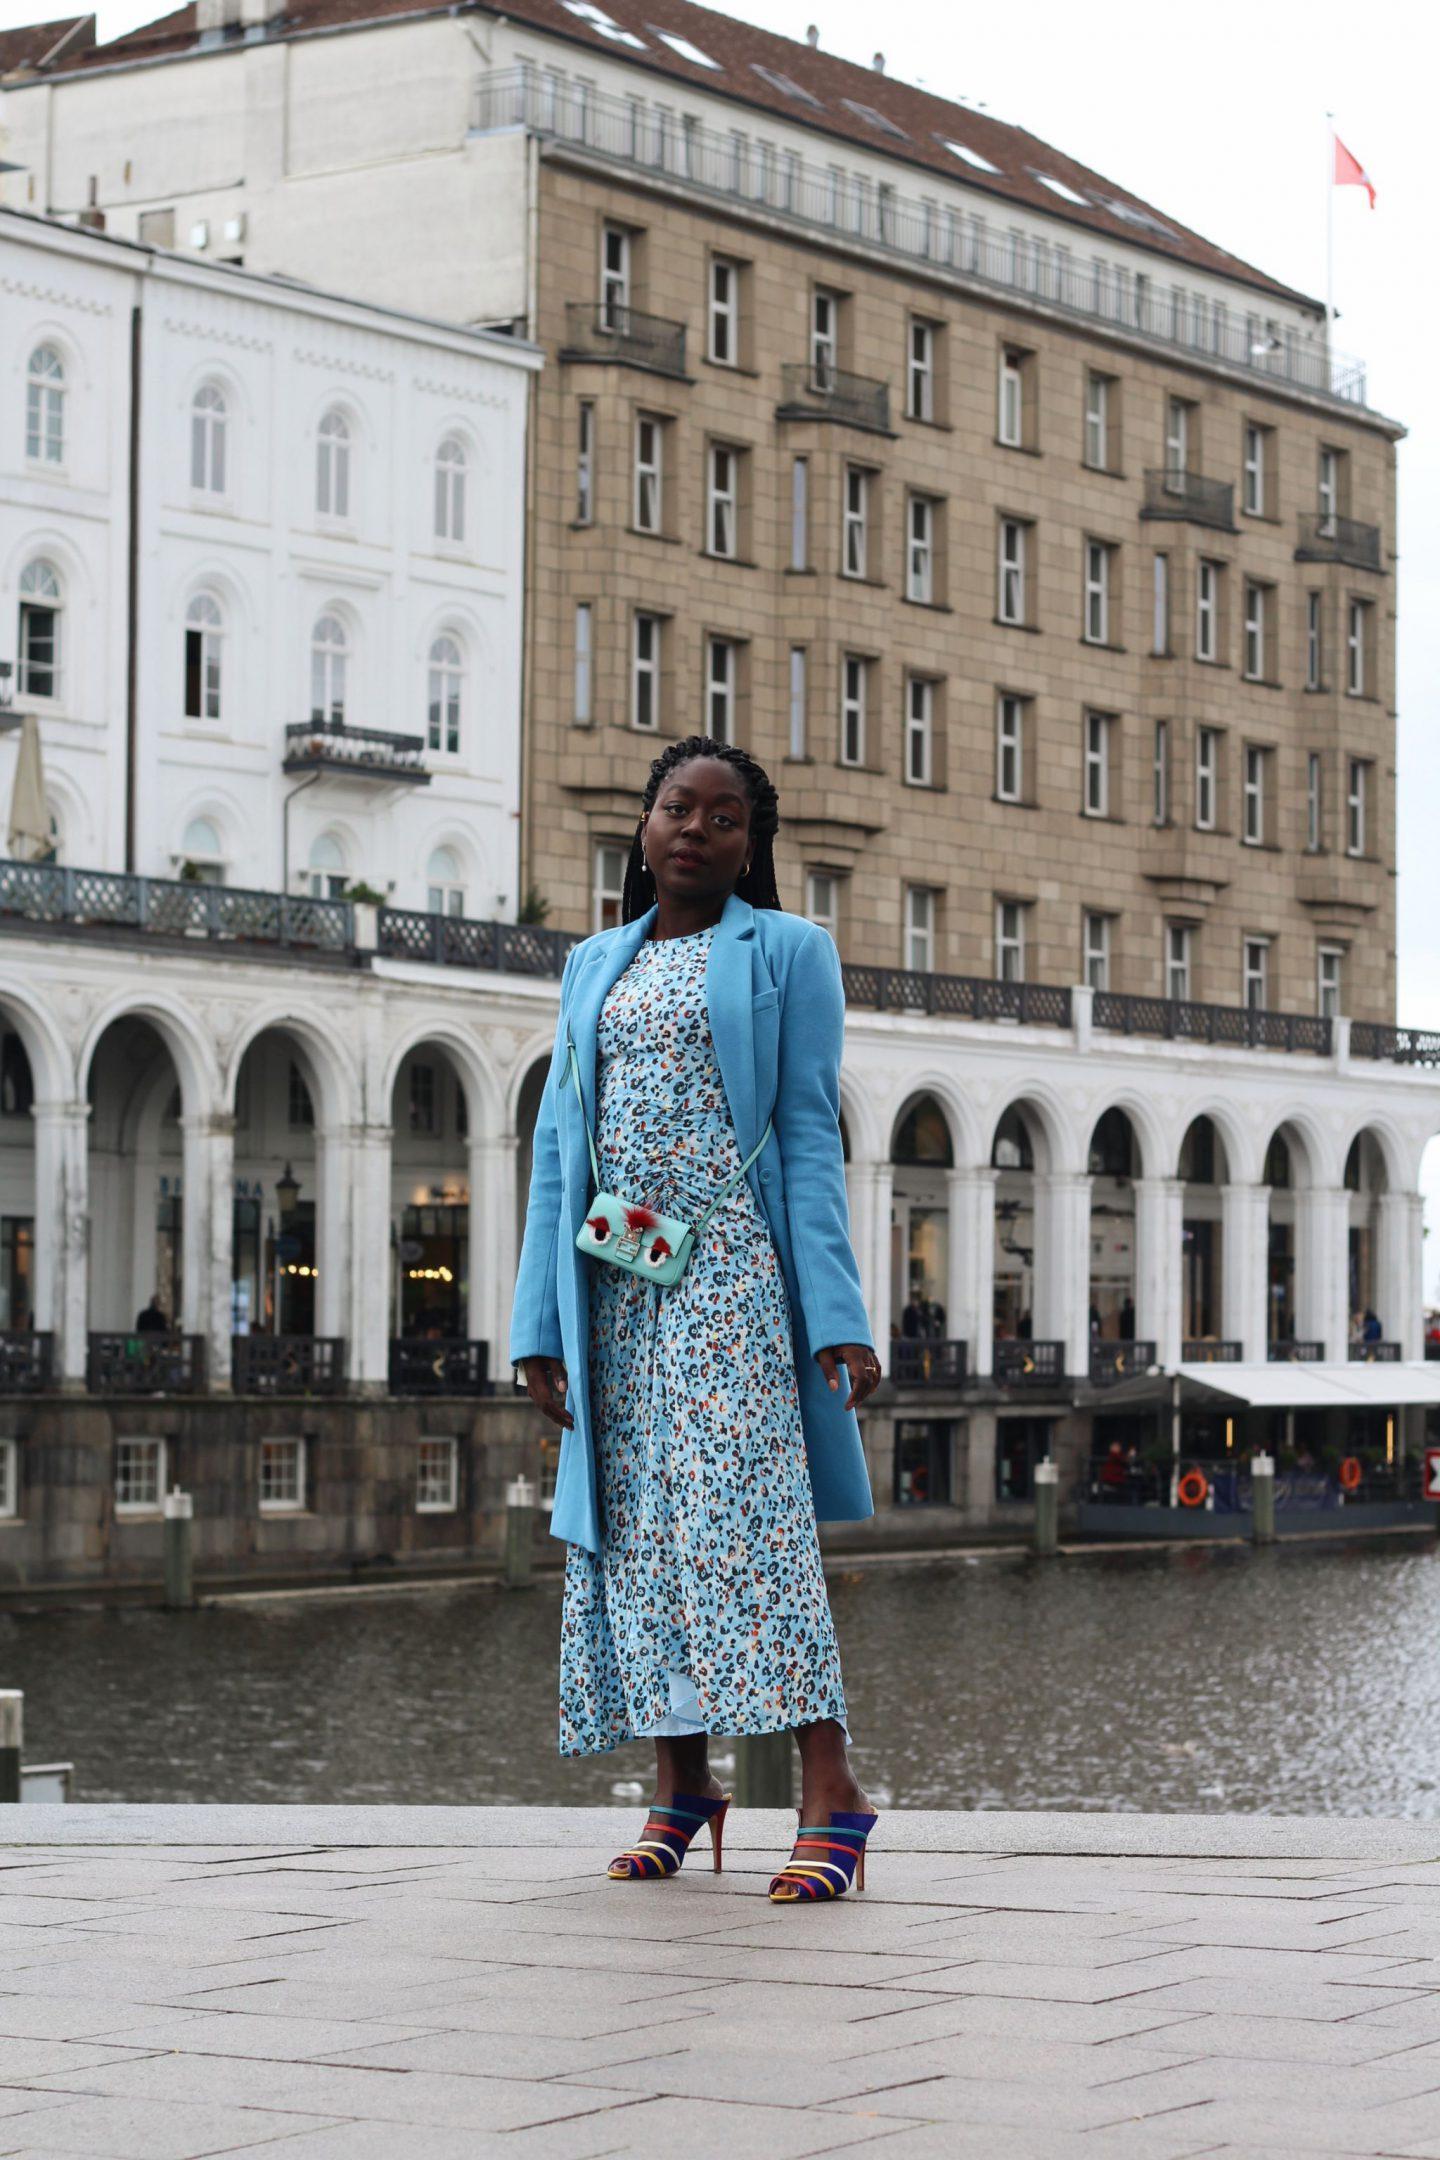 Lala_Berlin_Streetstyle_Lois_Opoku_Fashion_Blogger_Fendi_Monster_Malone_Souliers_lisforlois_7